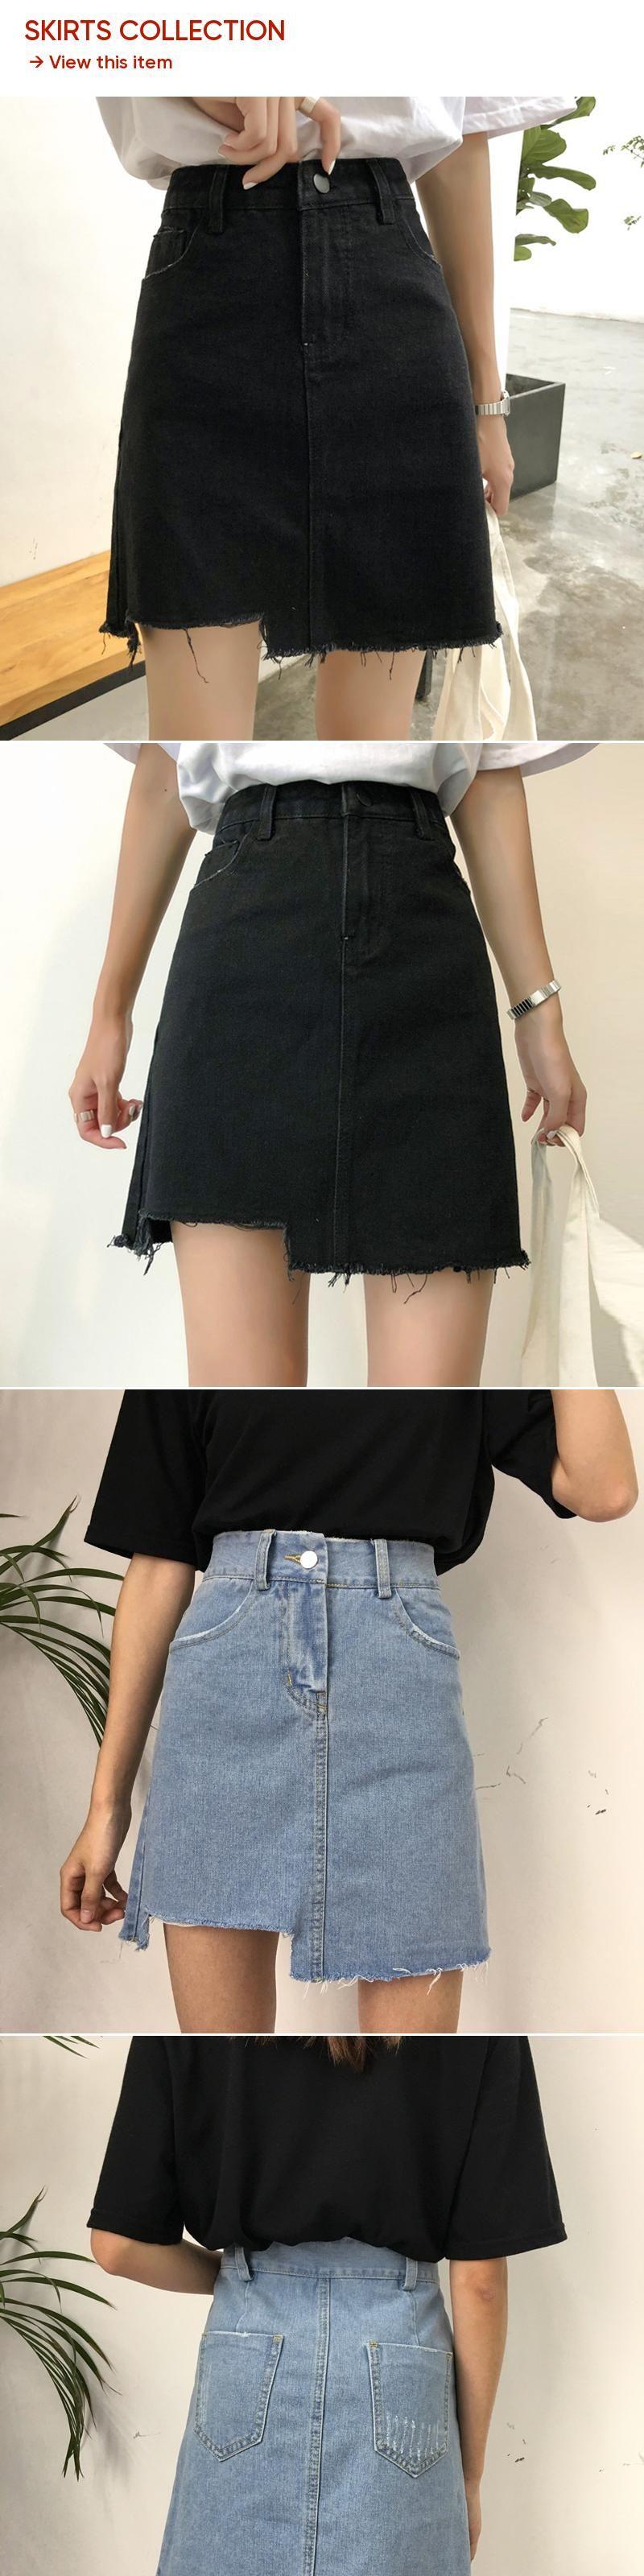 f25983856b2 Kpop Harajuku 2018 New All-matched Casual Jeans Skirt Summer Fashion High  Waist Skirts Womens Pockets Button Denim Skirt Female